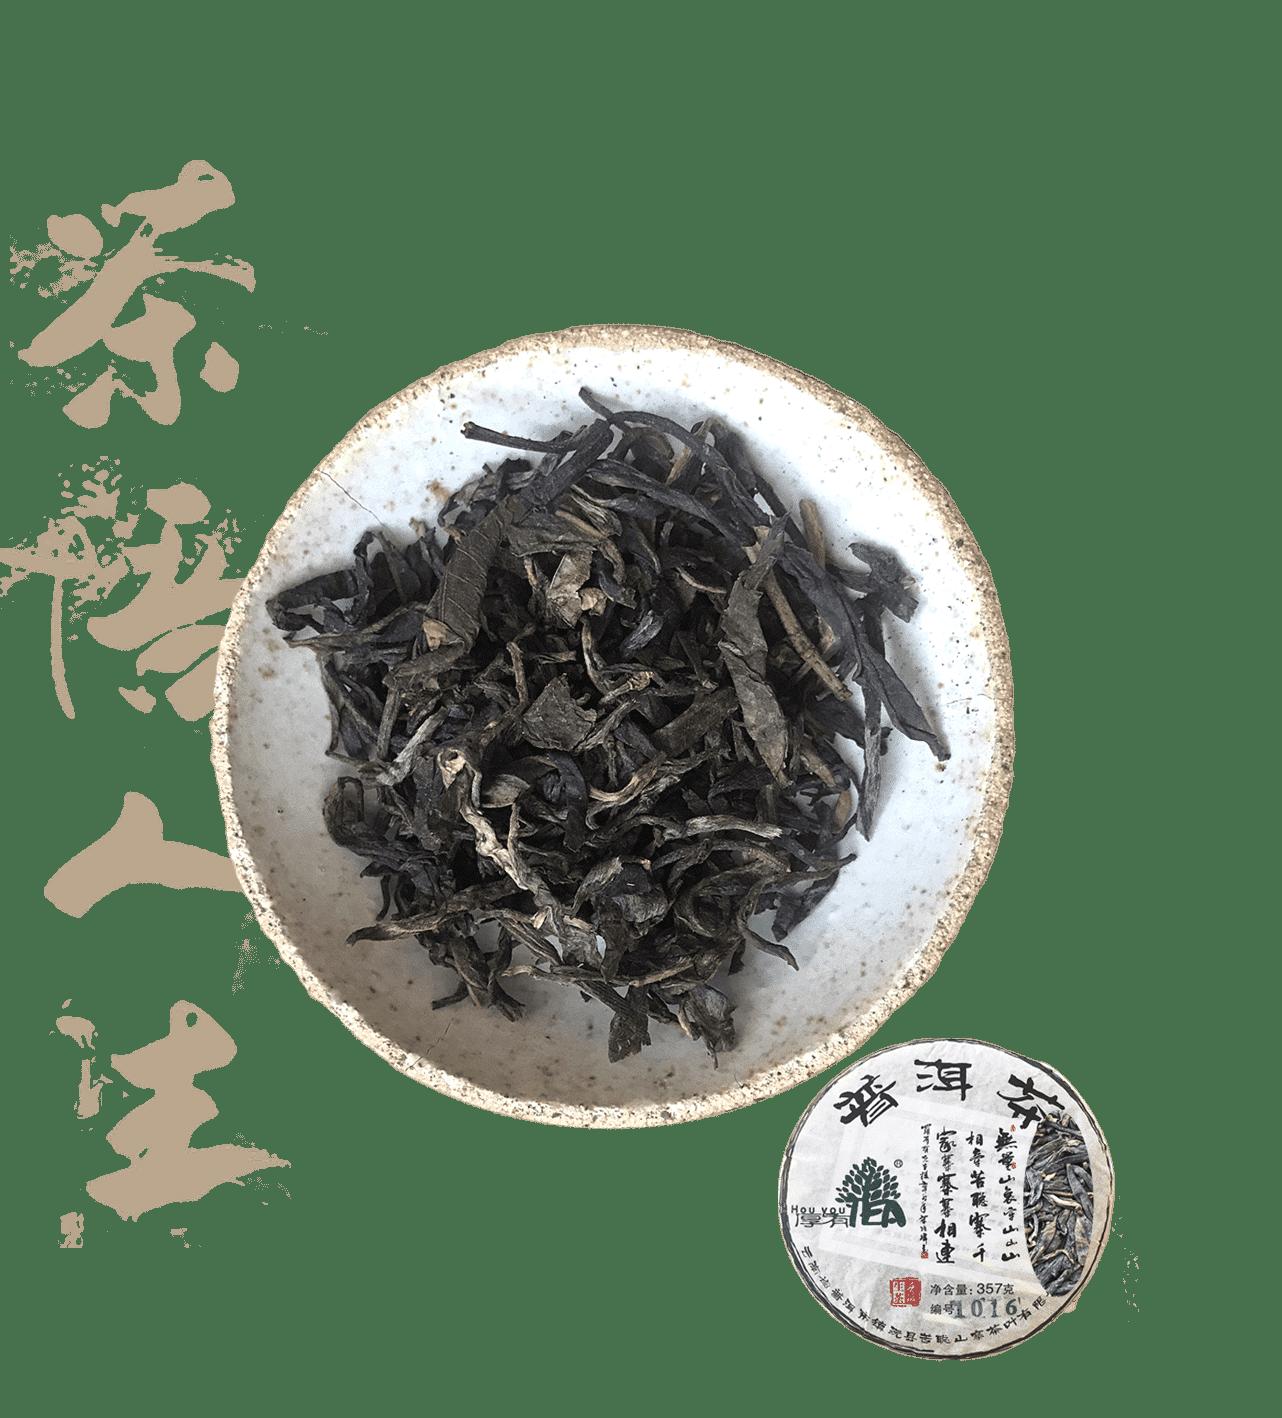 hou you tea 1016 est un thé pu erh sheng